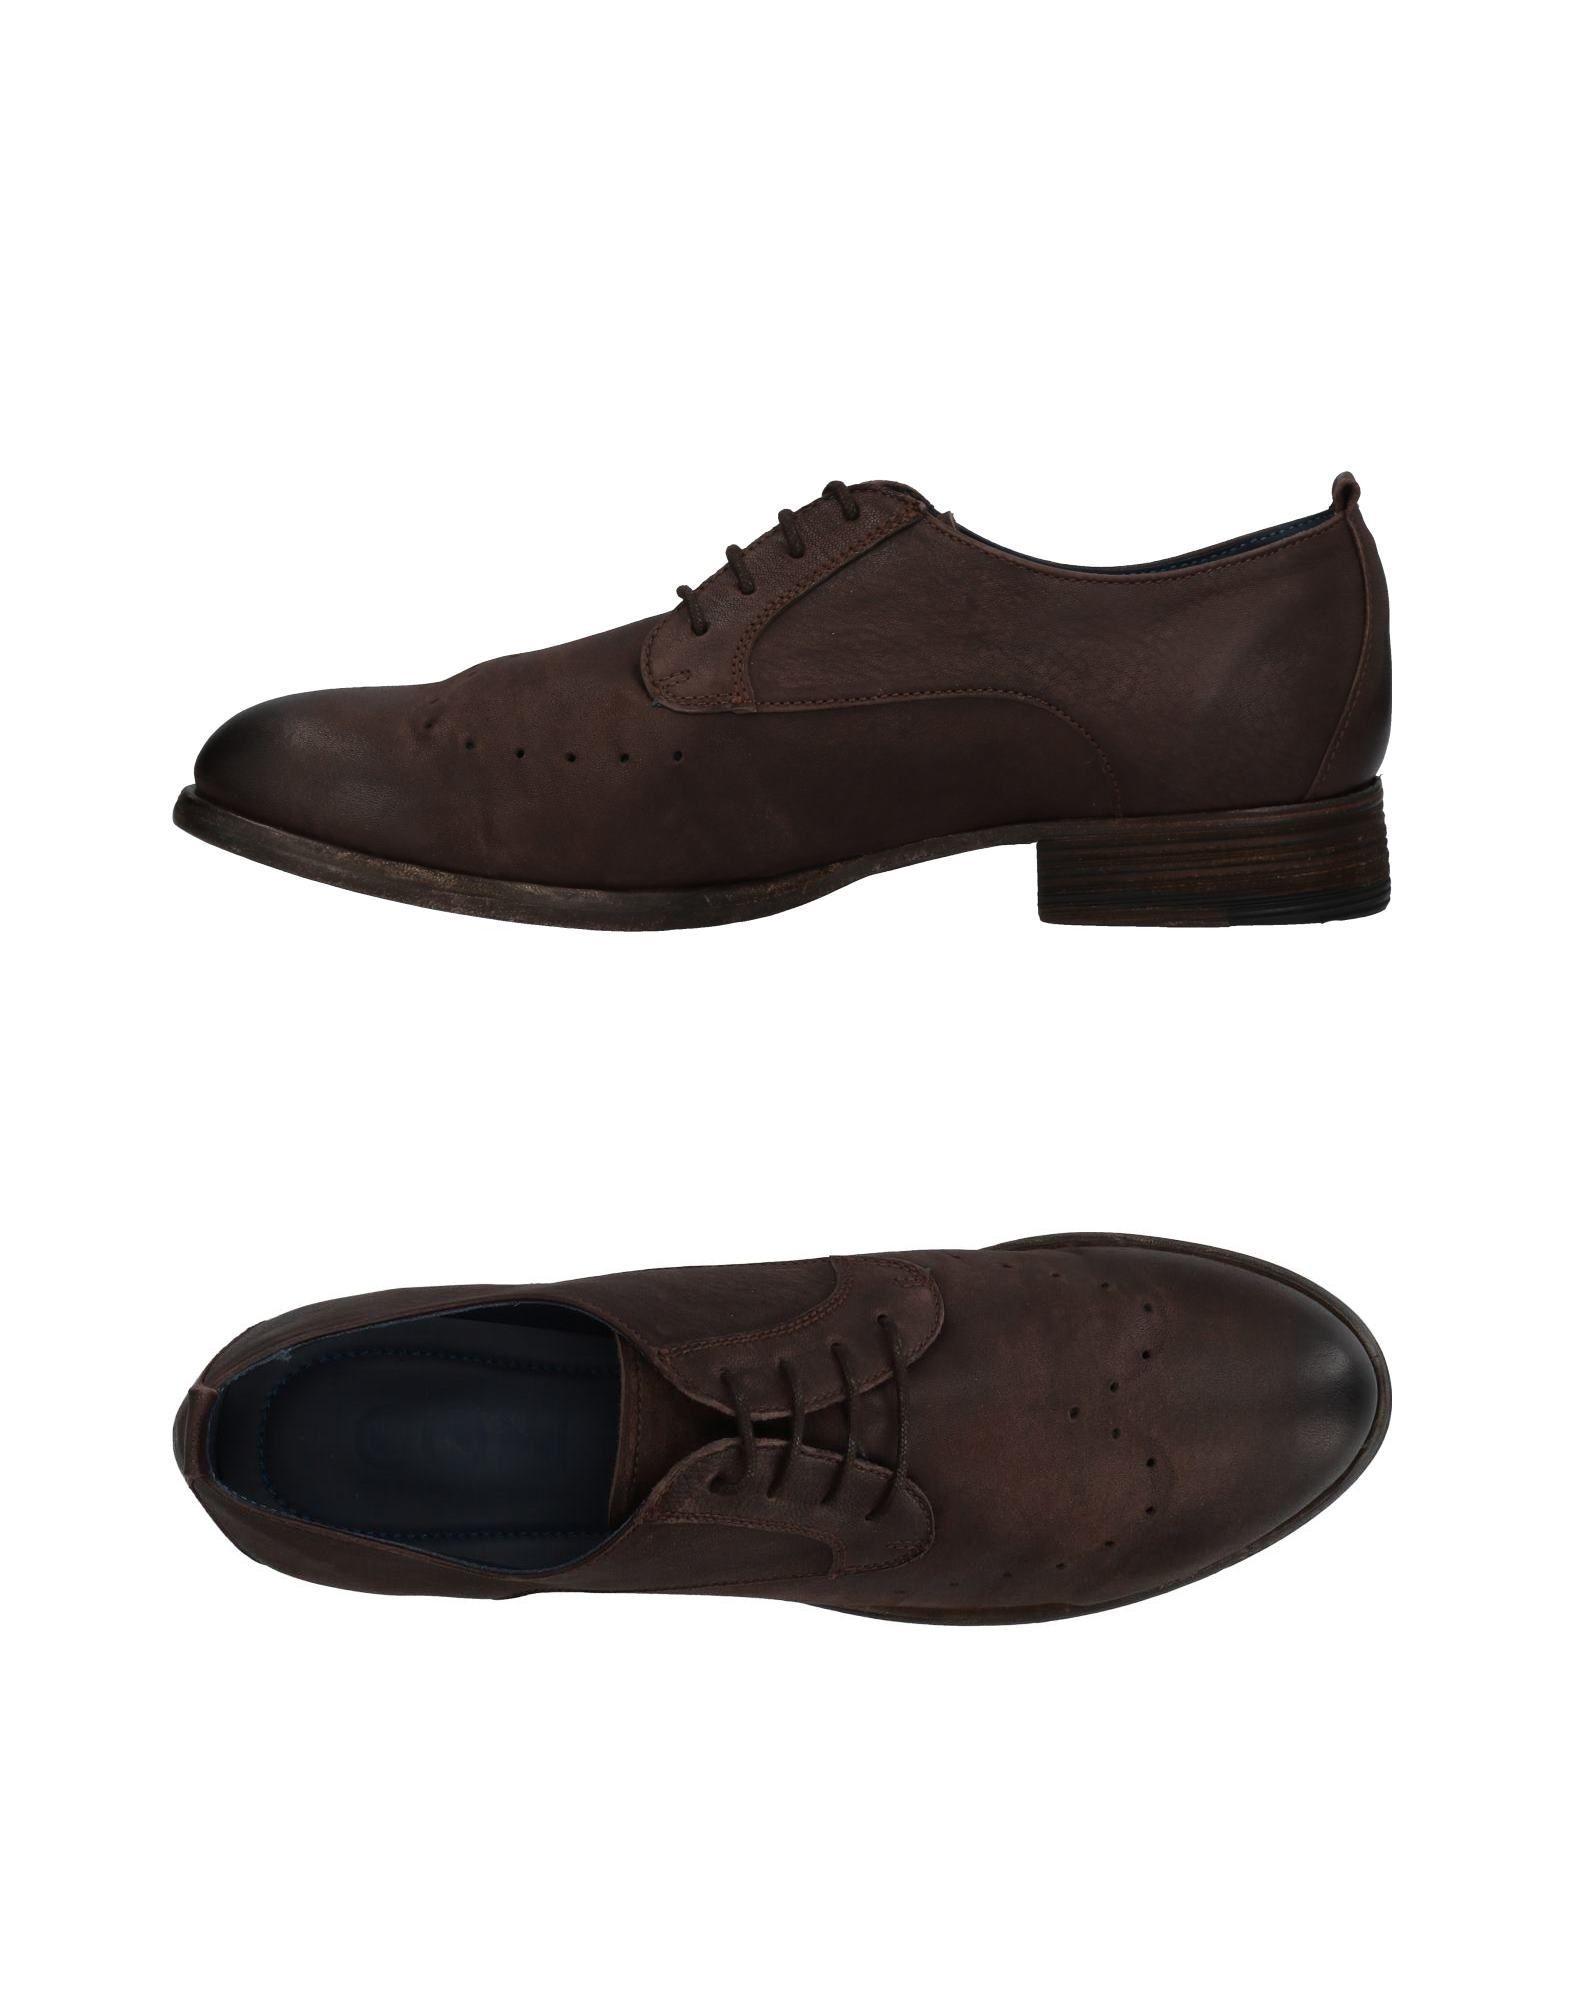 Creation Of Minds Schnürschuhe Damen   Damen 11457946UX Gute Qualität beliebte Schuhe ae3f59